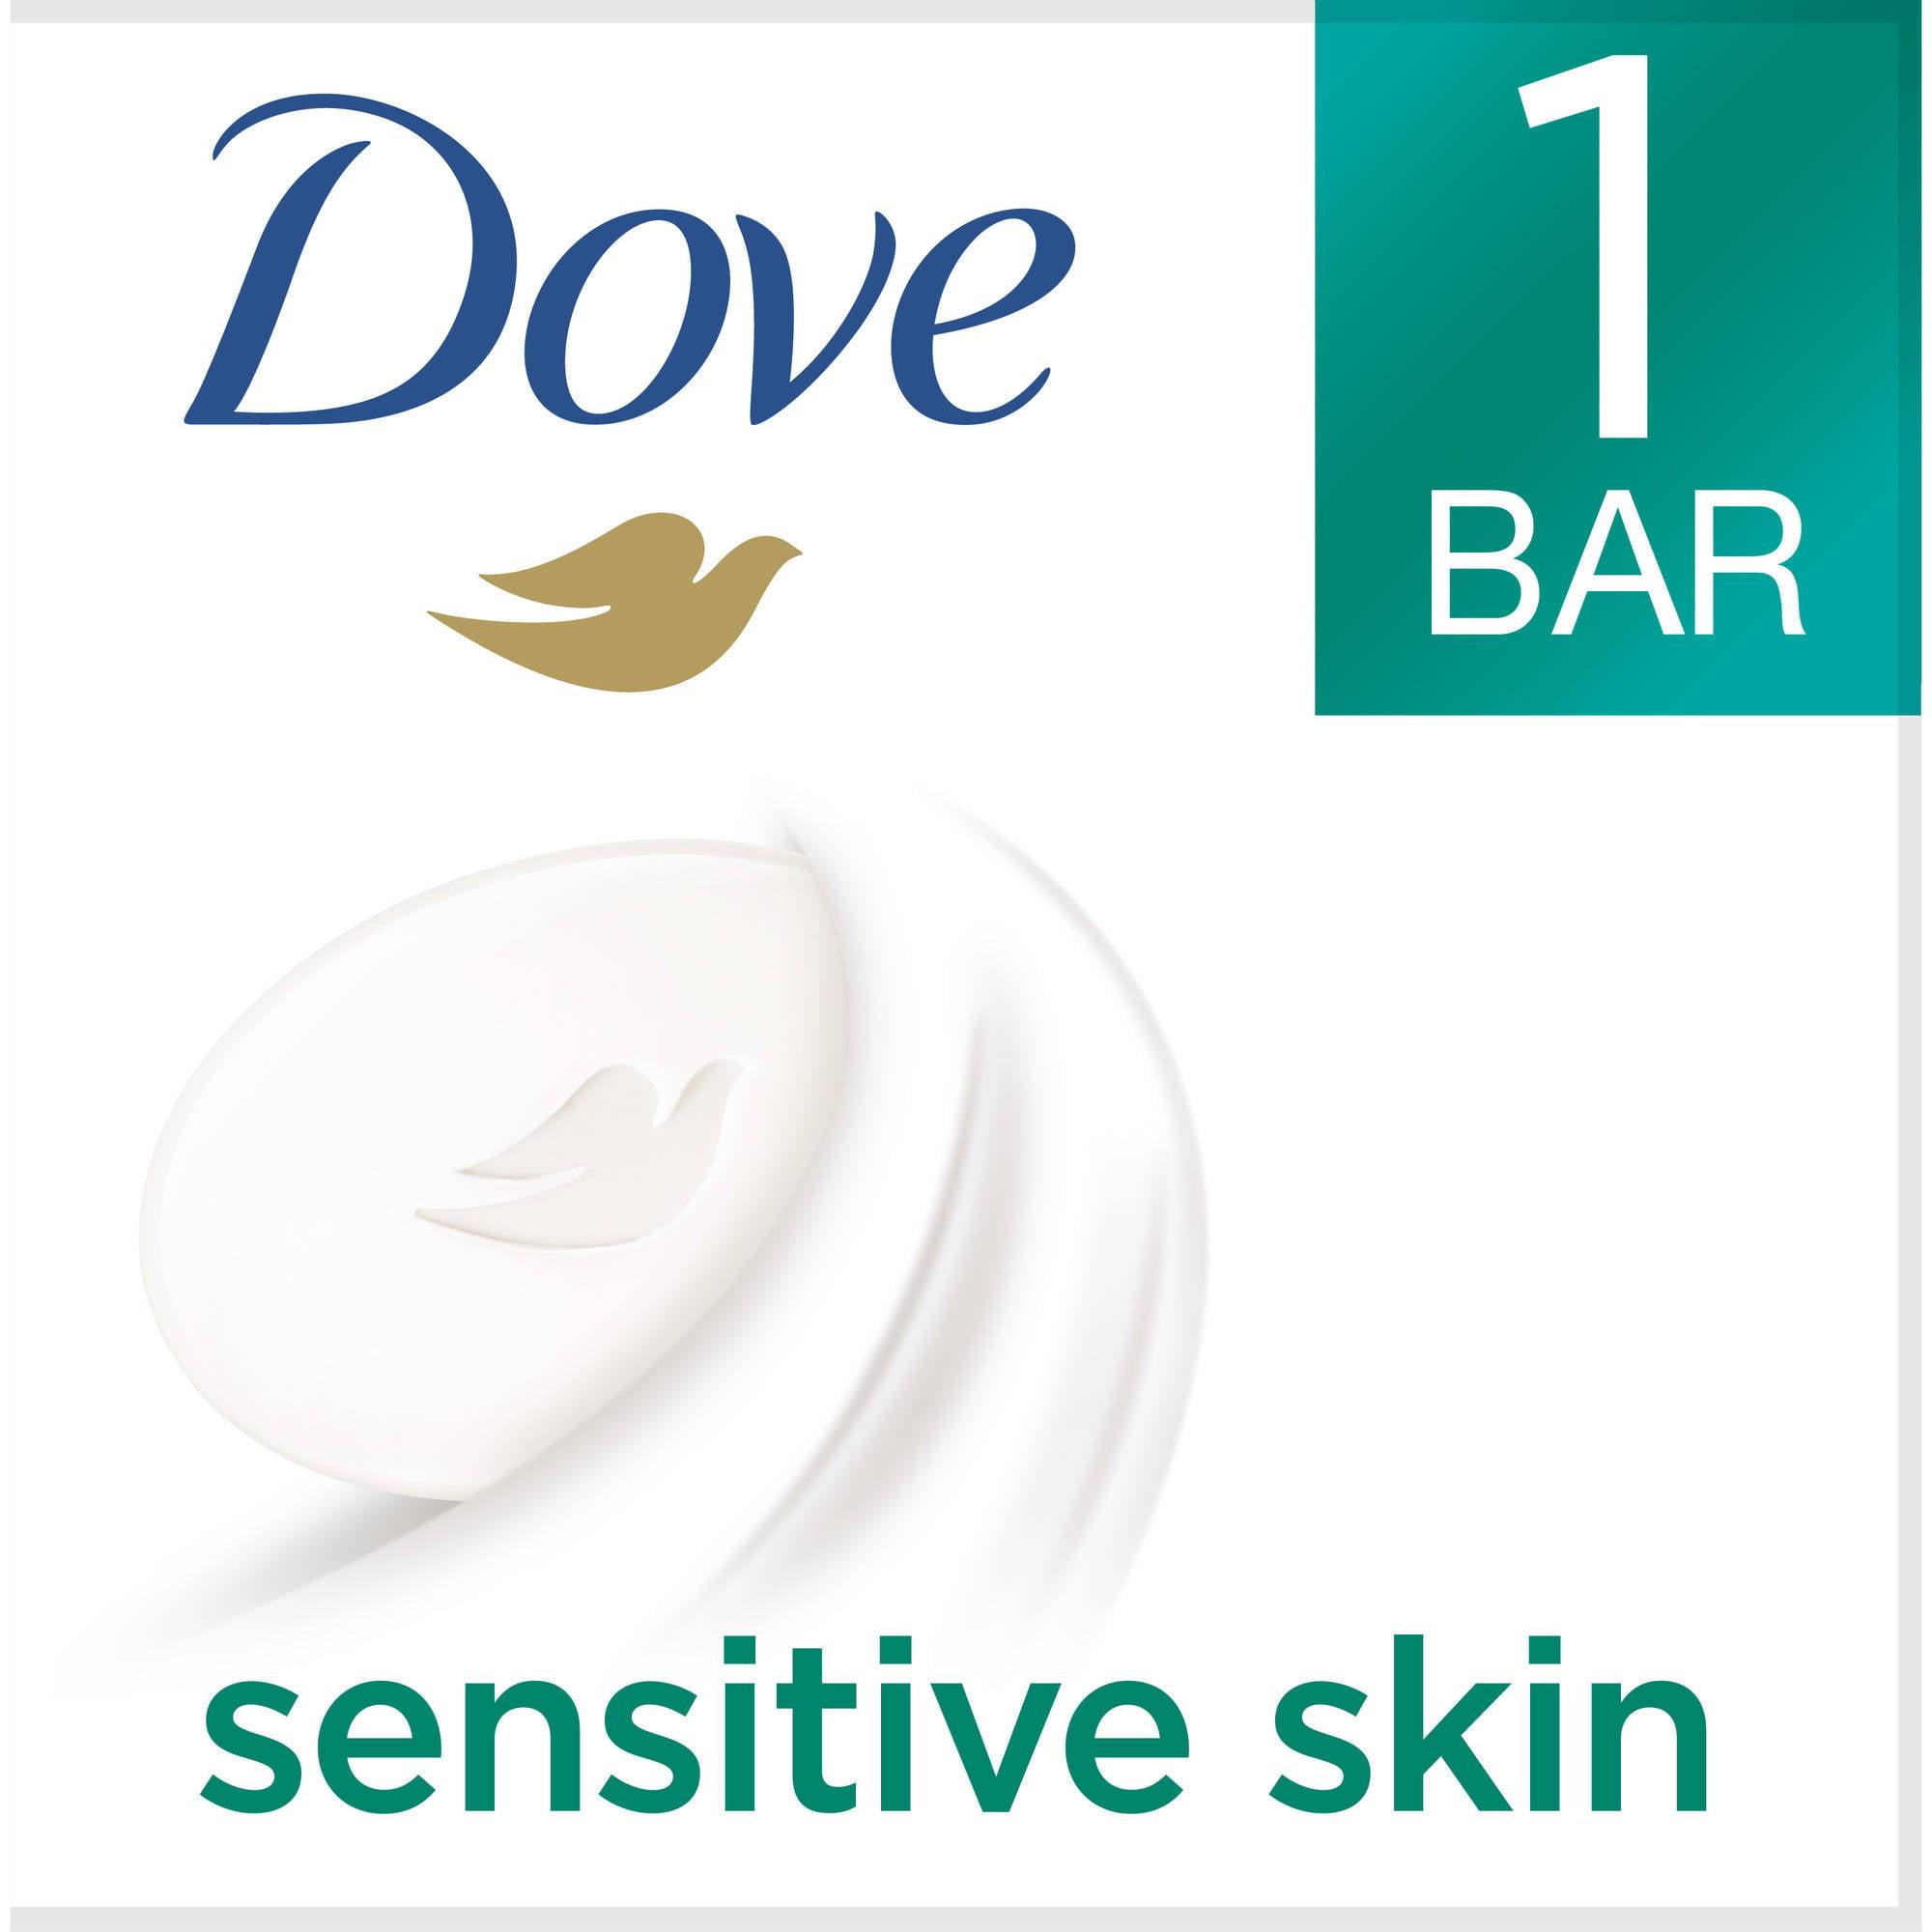 Dove Beauty Moisturizing Cream Bar Soap For Sensitive Skin, Unscented - 3.15 Oz